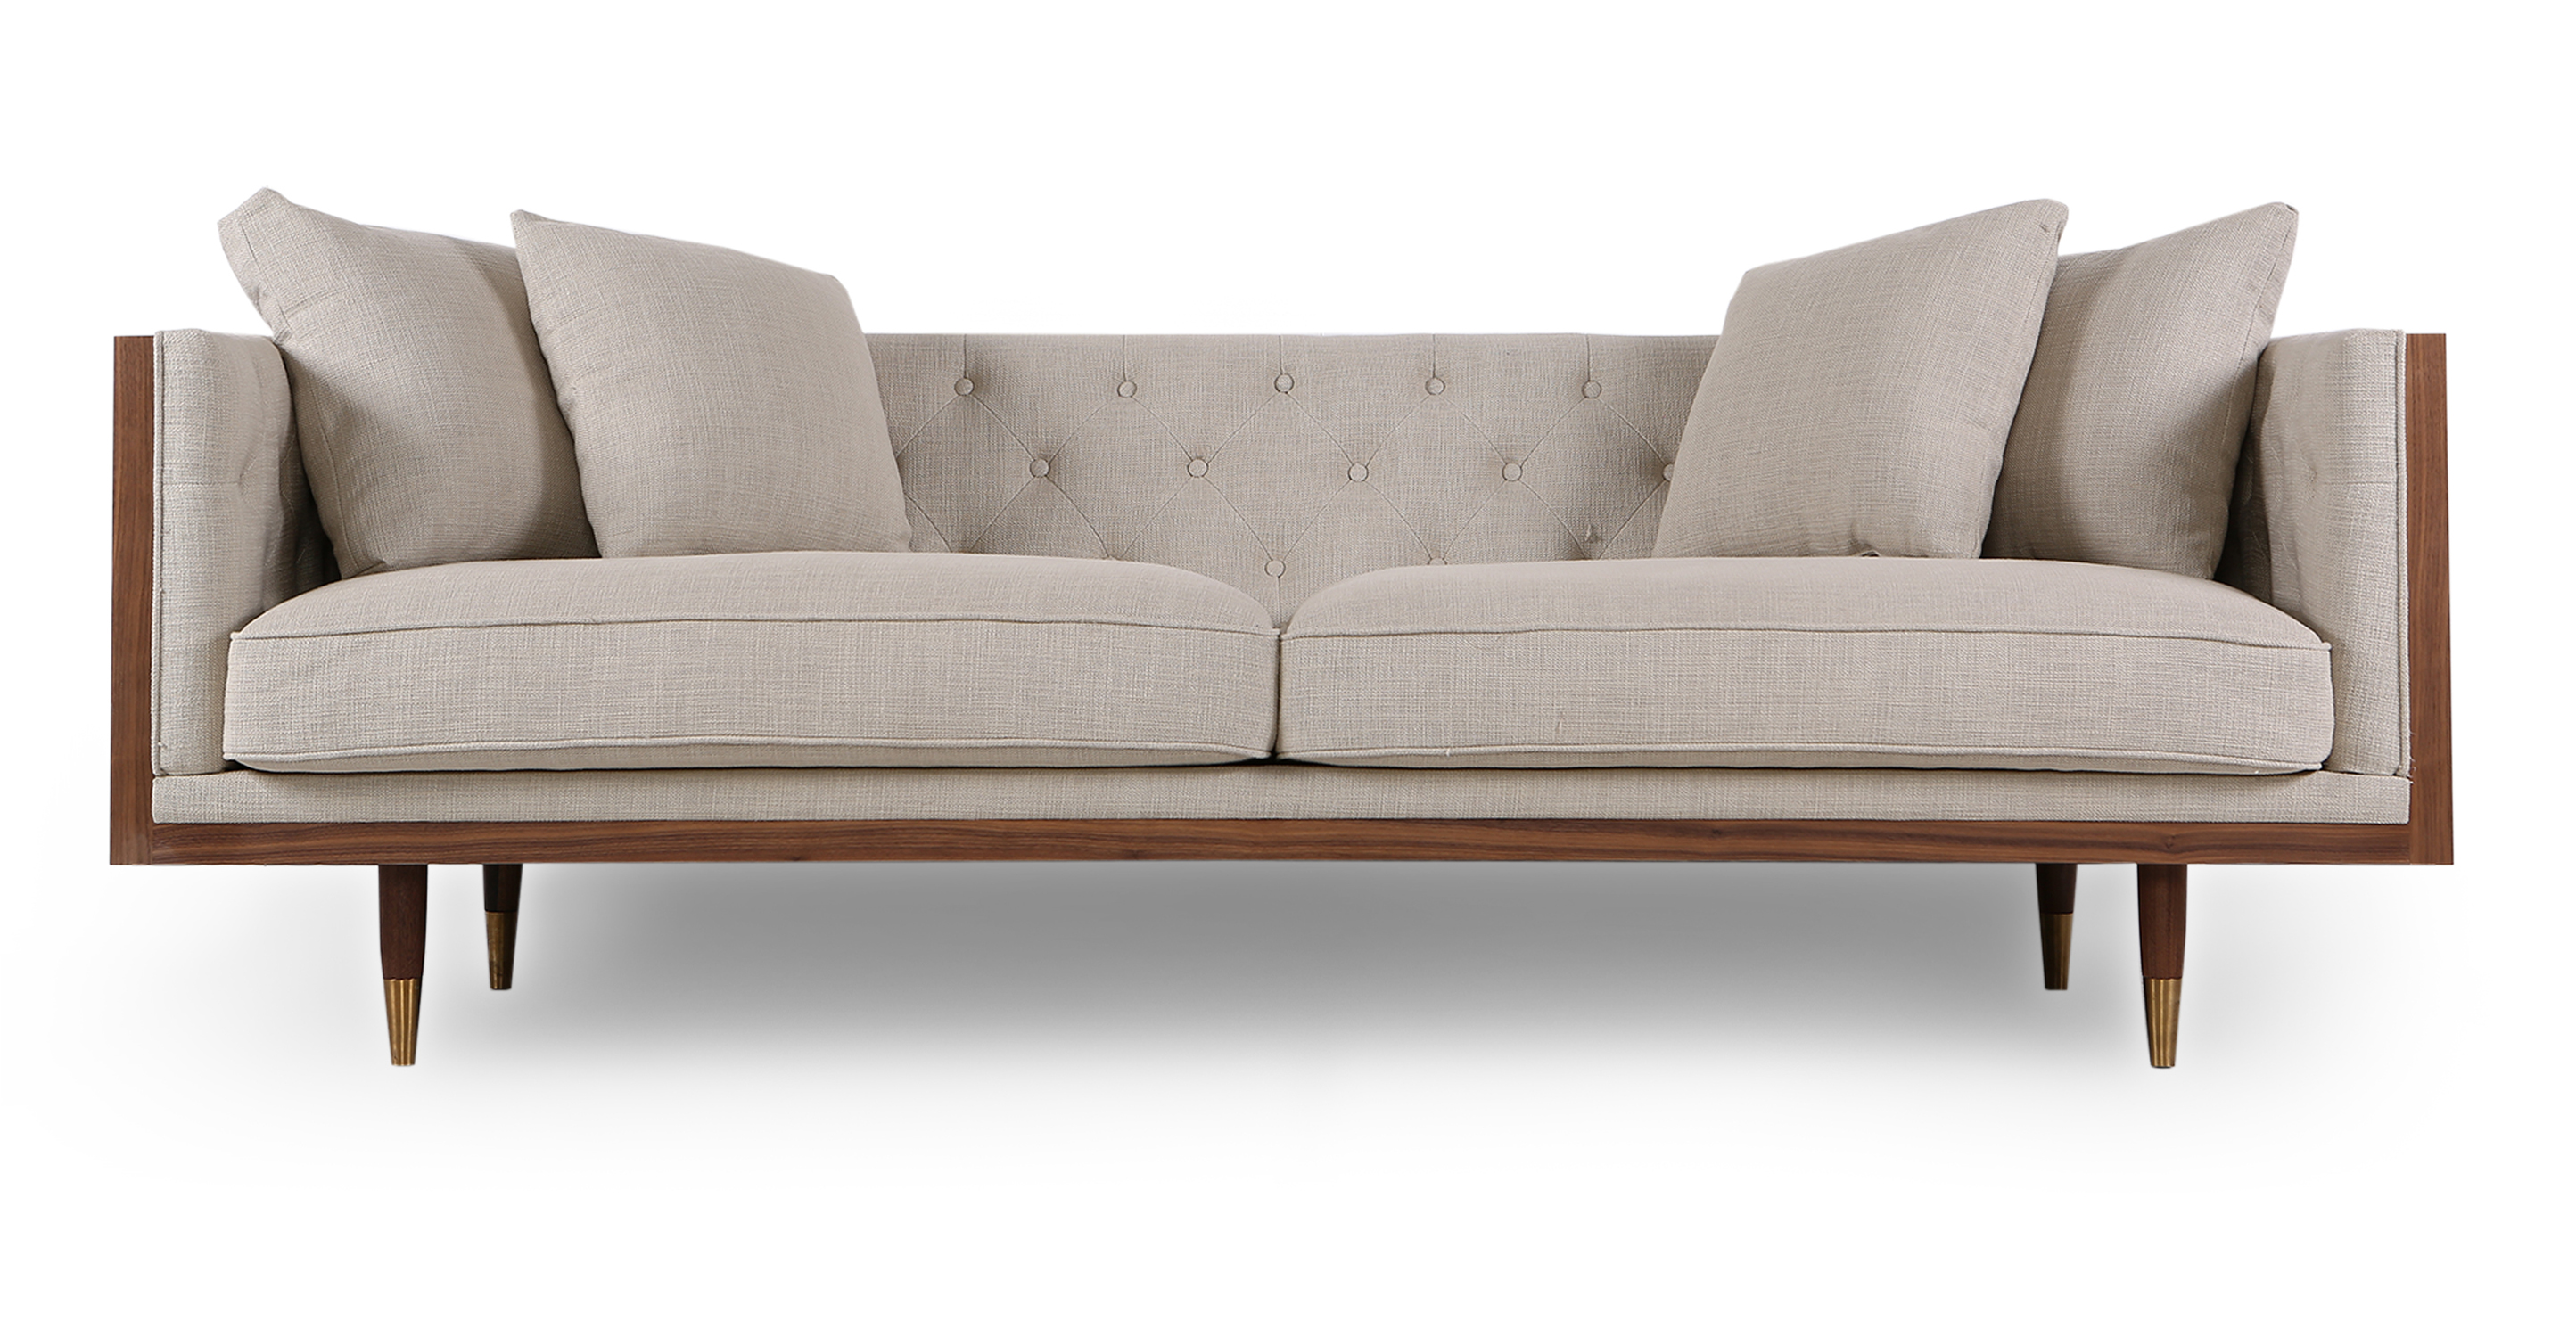 Woodrow Neo 87 Fabric Sofa Walnut Urban Hemp Kardiel